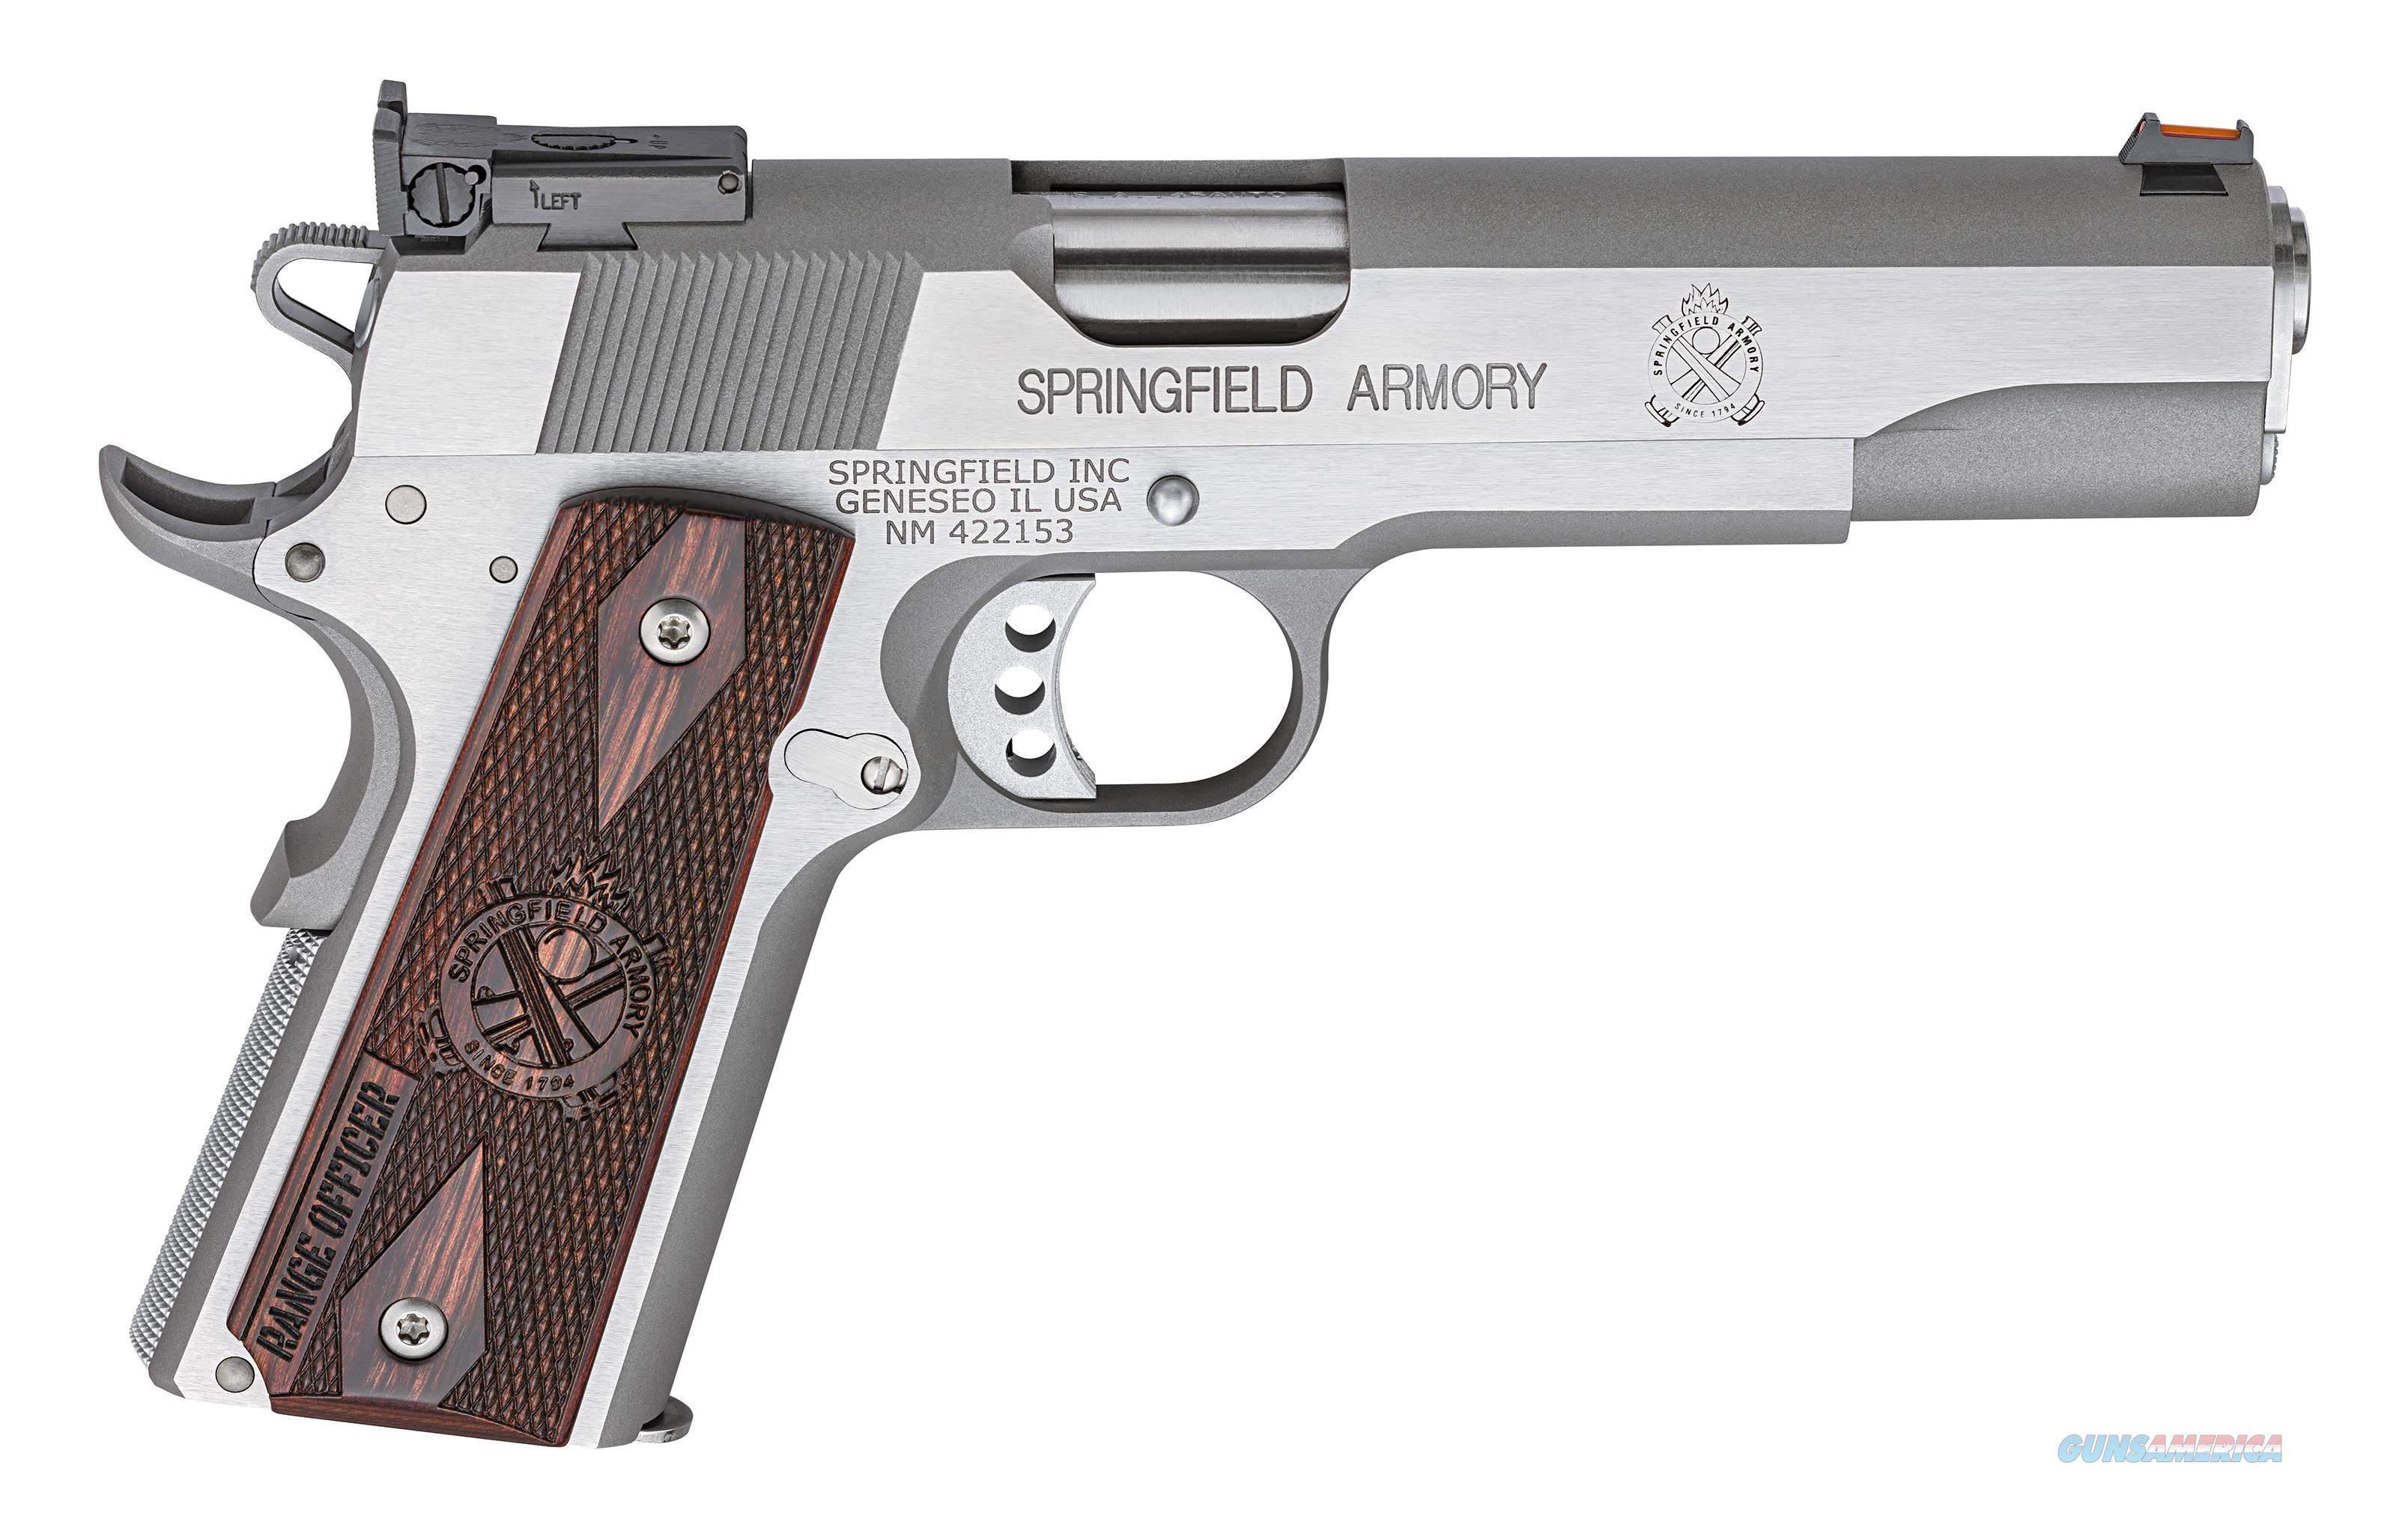 "Springfield 1911 Range Officer Stainless .45 ACP 5"" 7rd PI9124L   Guns > Pistols > Springfield Armory Pistols > 1911 Type"